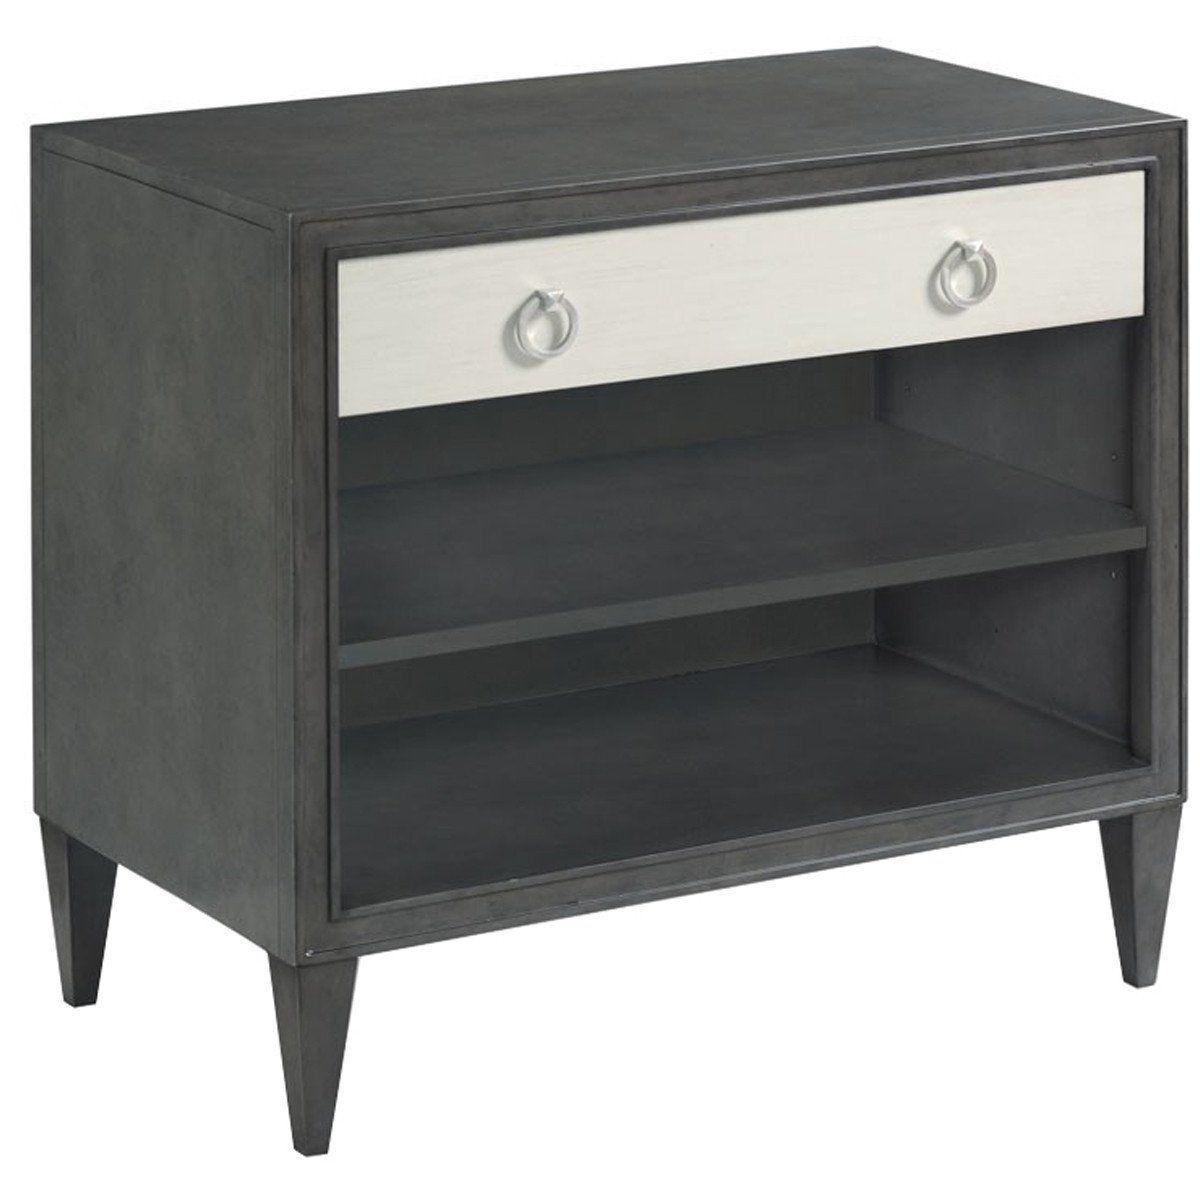 Woodbridge Furniture Charcoal Ramsey Bedside Table Nightstands